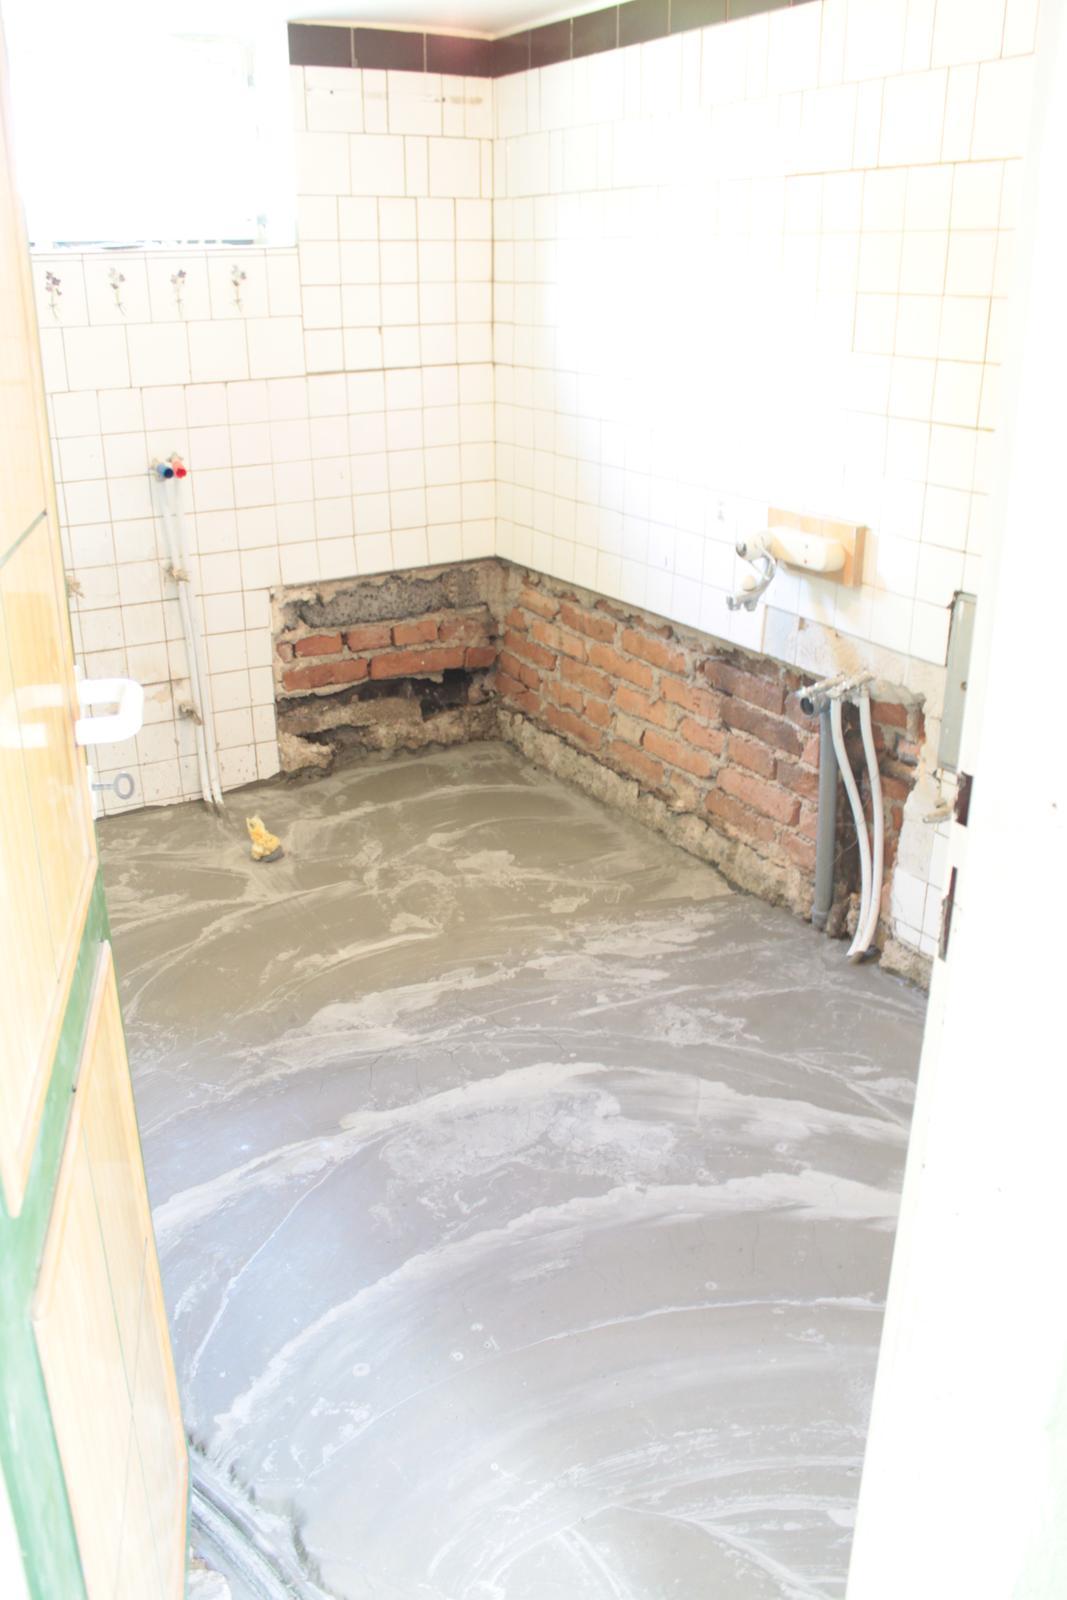 Naša rekonštrukcia - vyliata podlaha